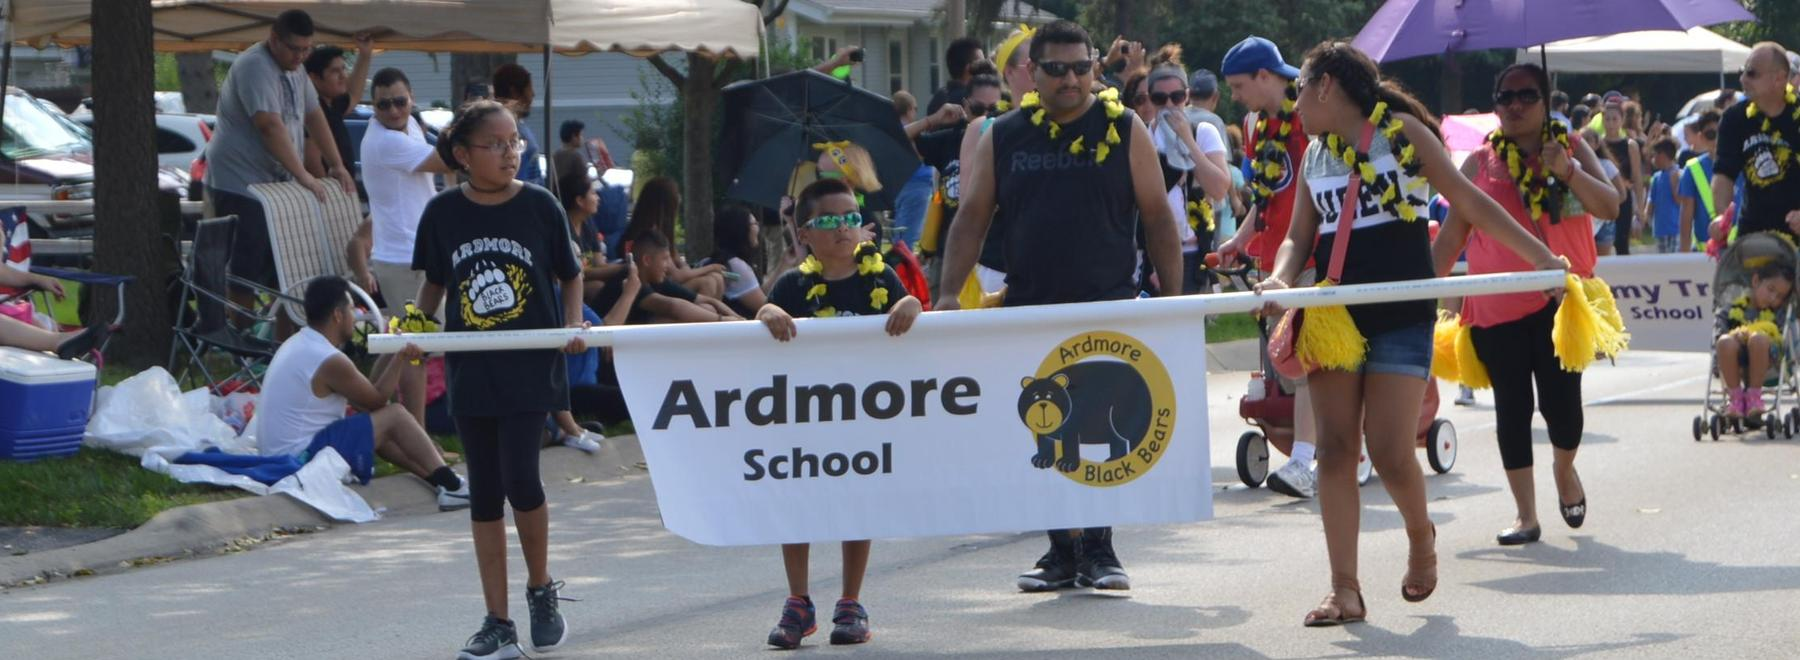 Ardmore in parade